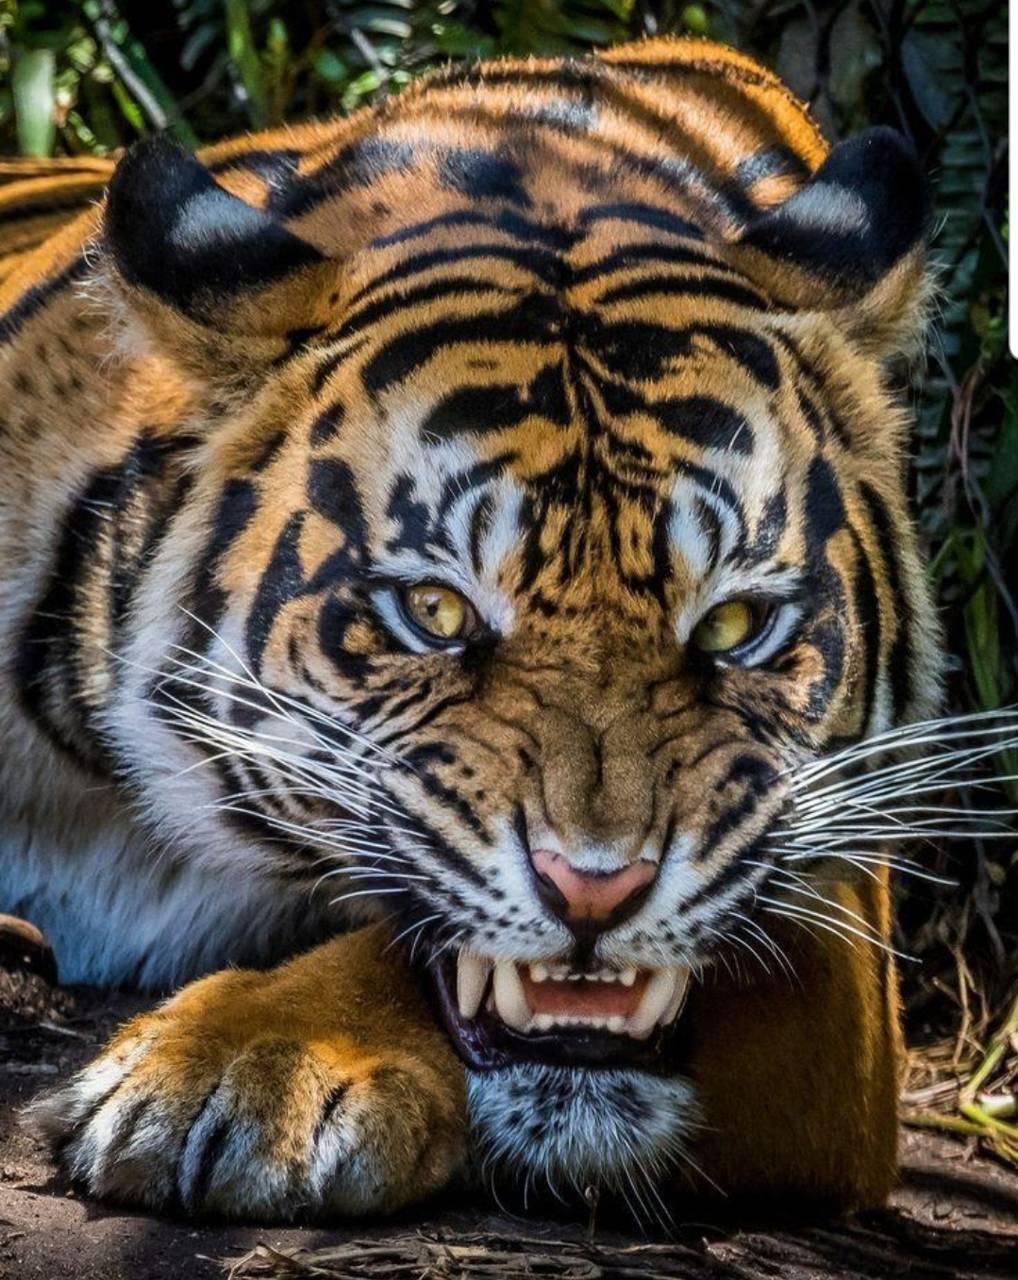 Vicious Tiger